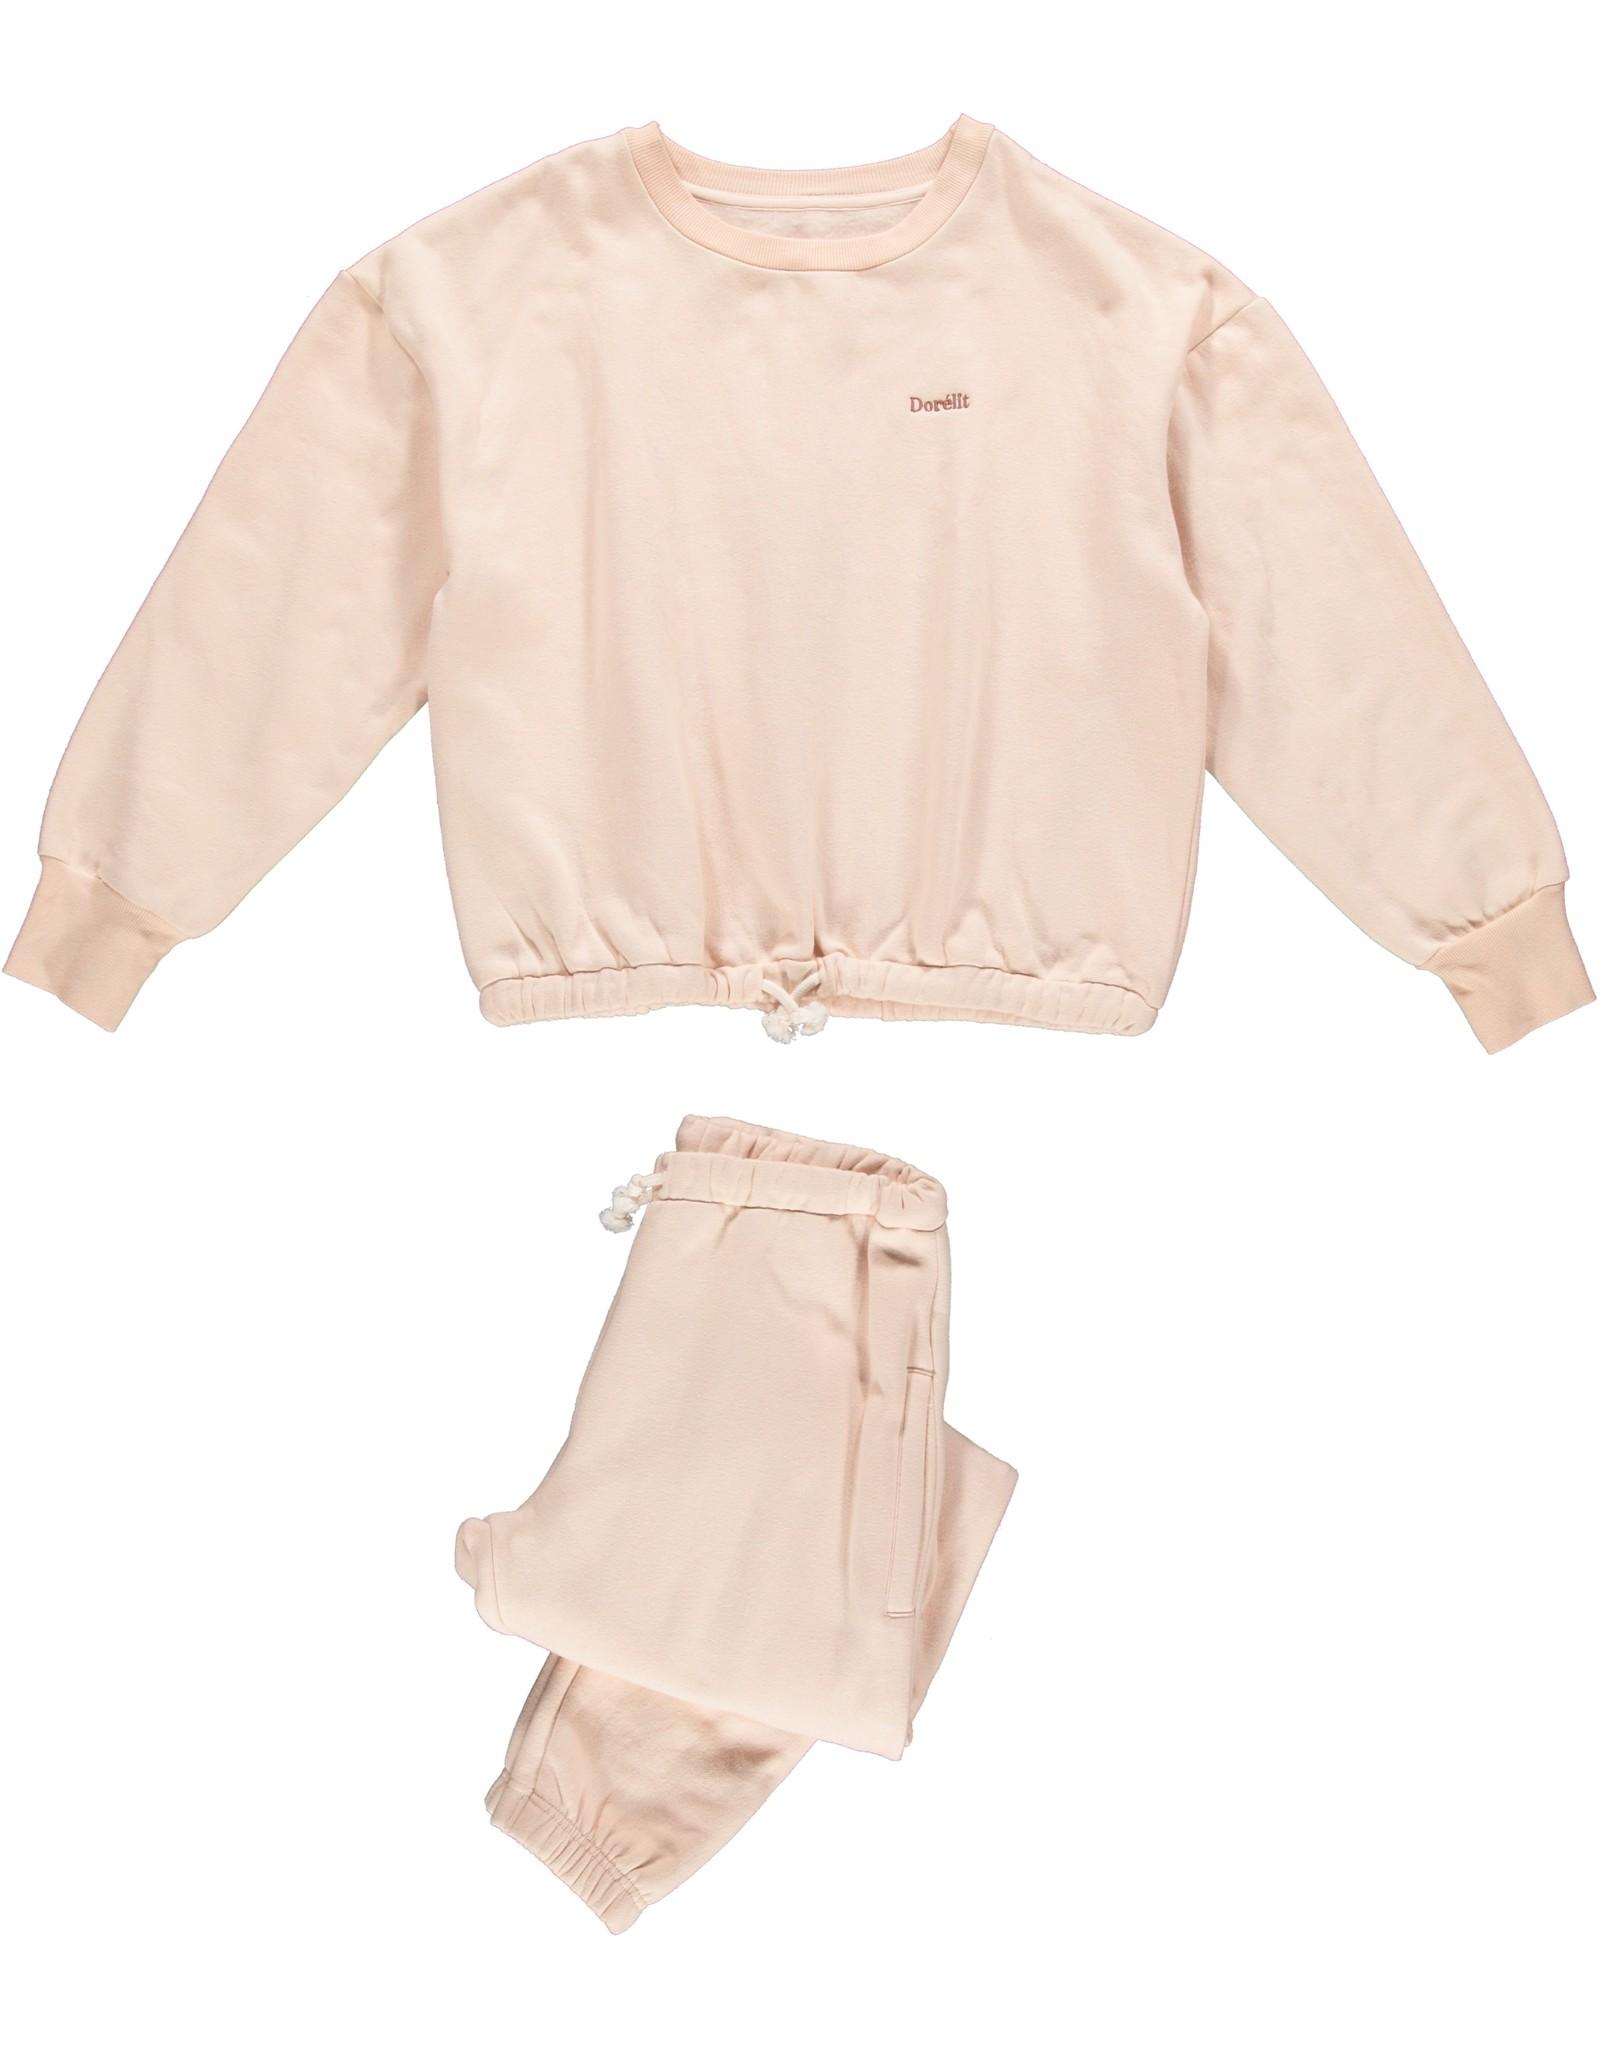 Dorélit Freya + Felix   Pajama Set Fleece   Rose